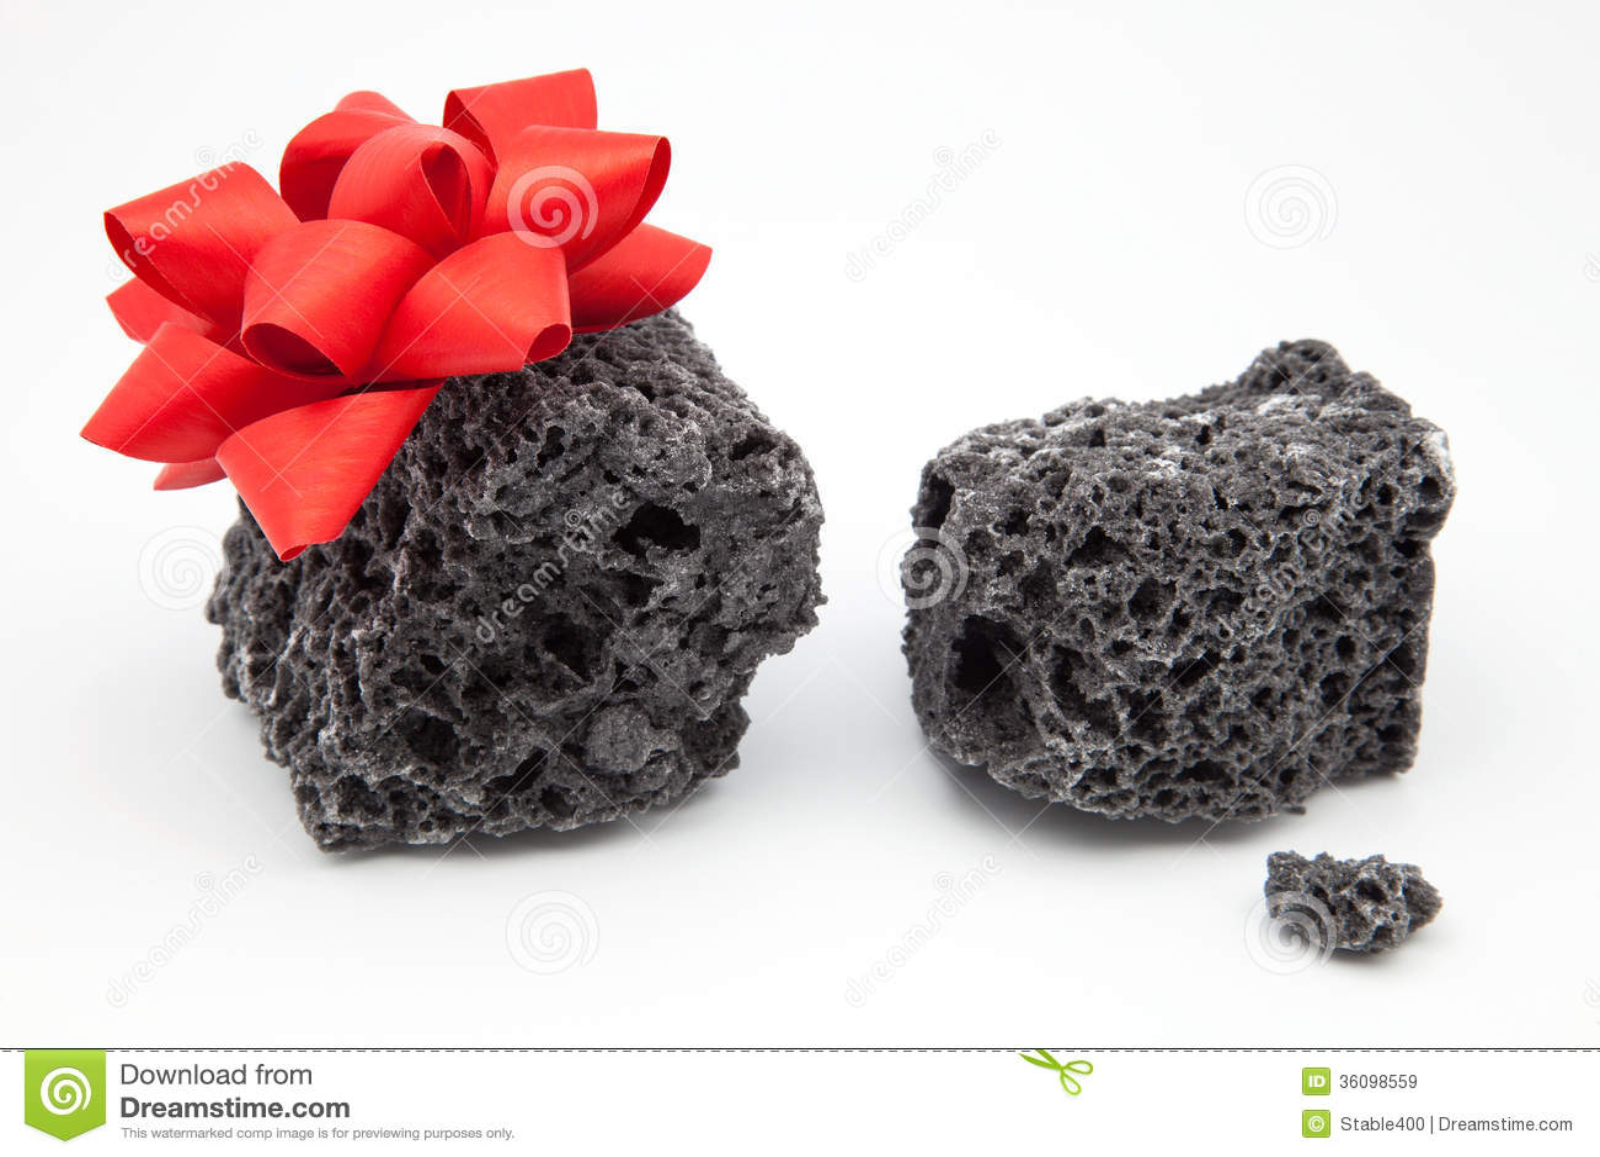 Coal of gift stock image. Image of white, sullen, stinging - 36098559